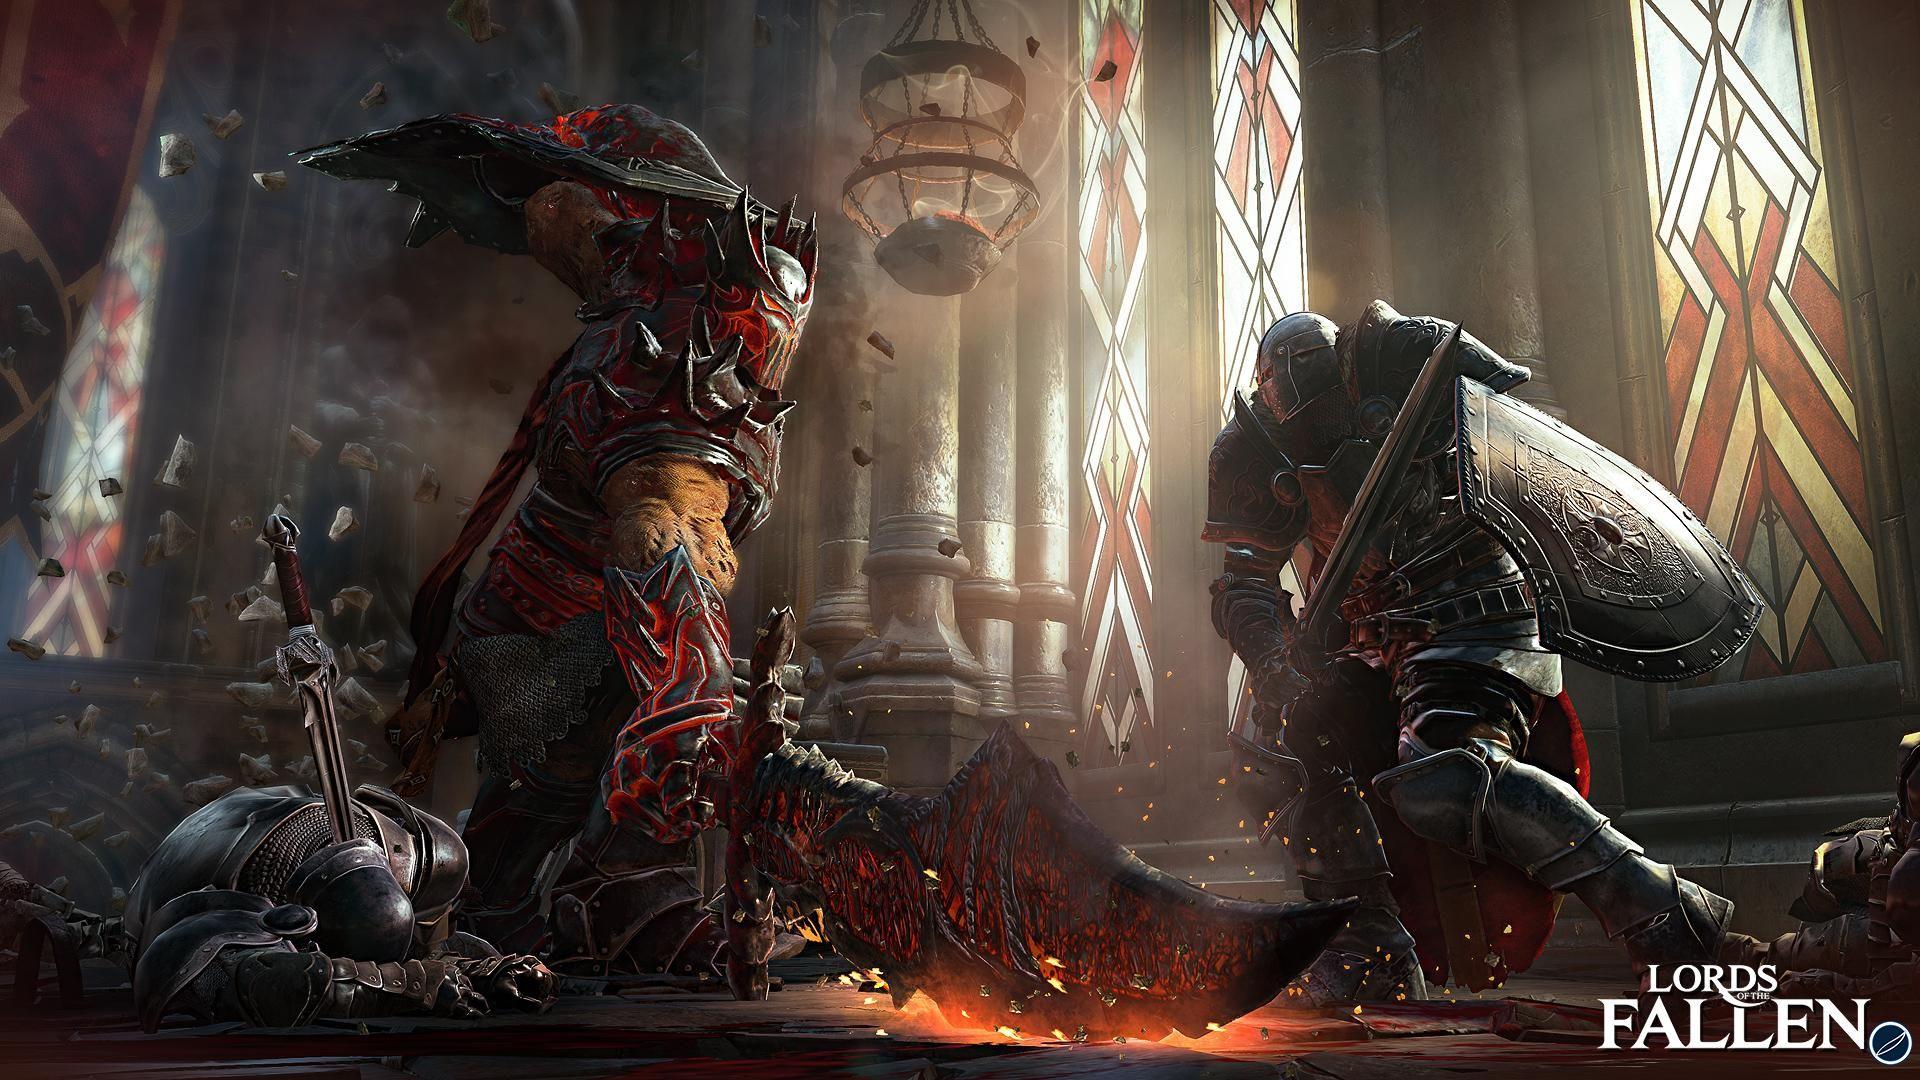 lords-of-the-fallen_XboxOne_w_8955.jpg